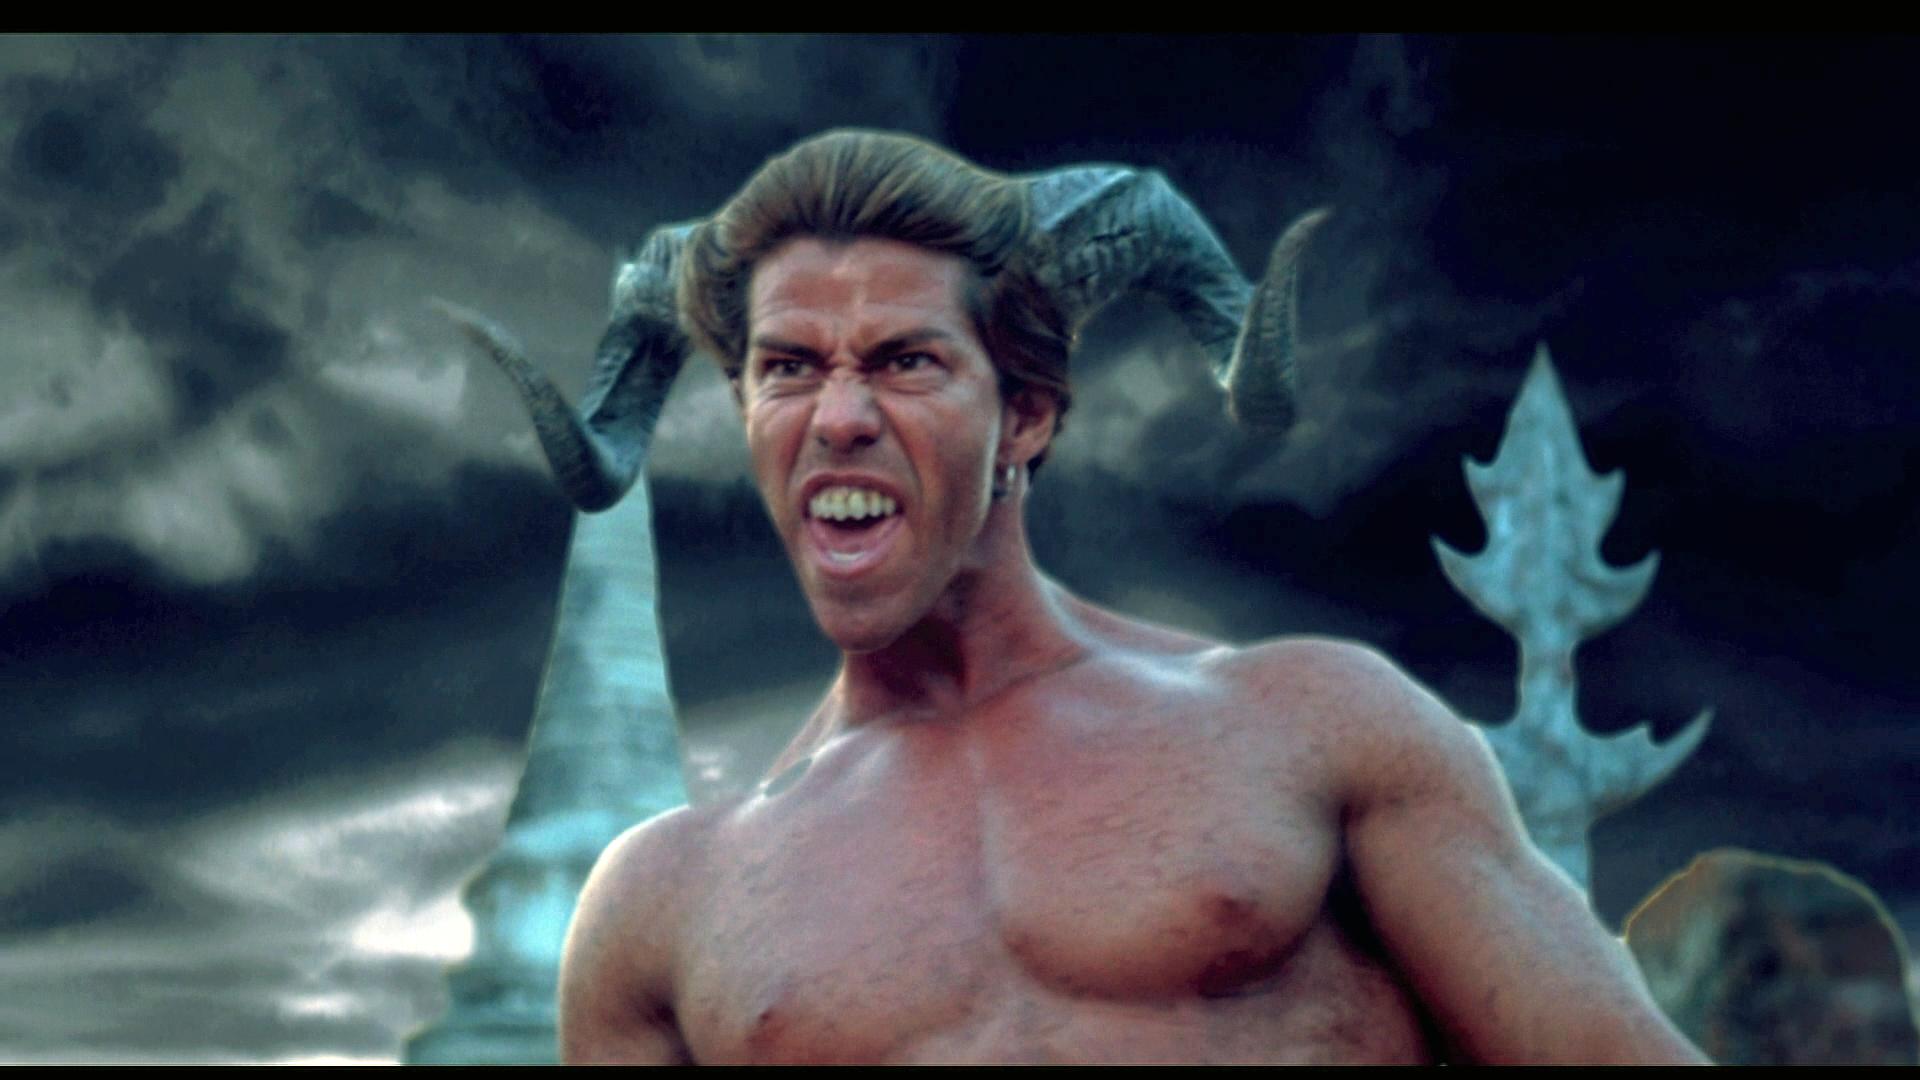 Motaro | Movie Morgue Wiki | FANDOM powered by Wikia